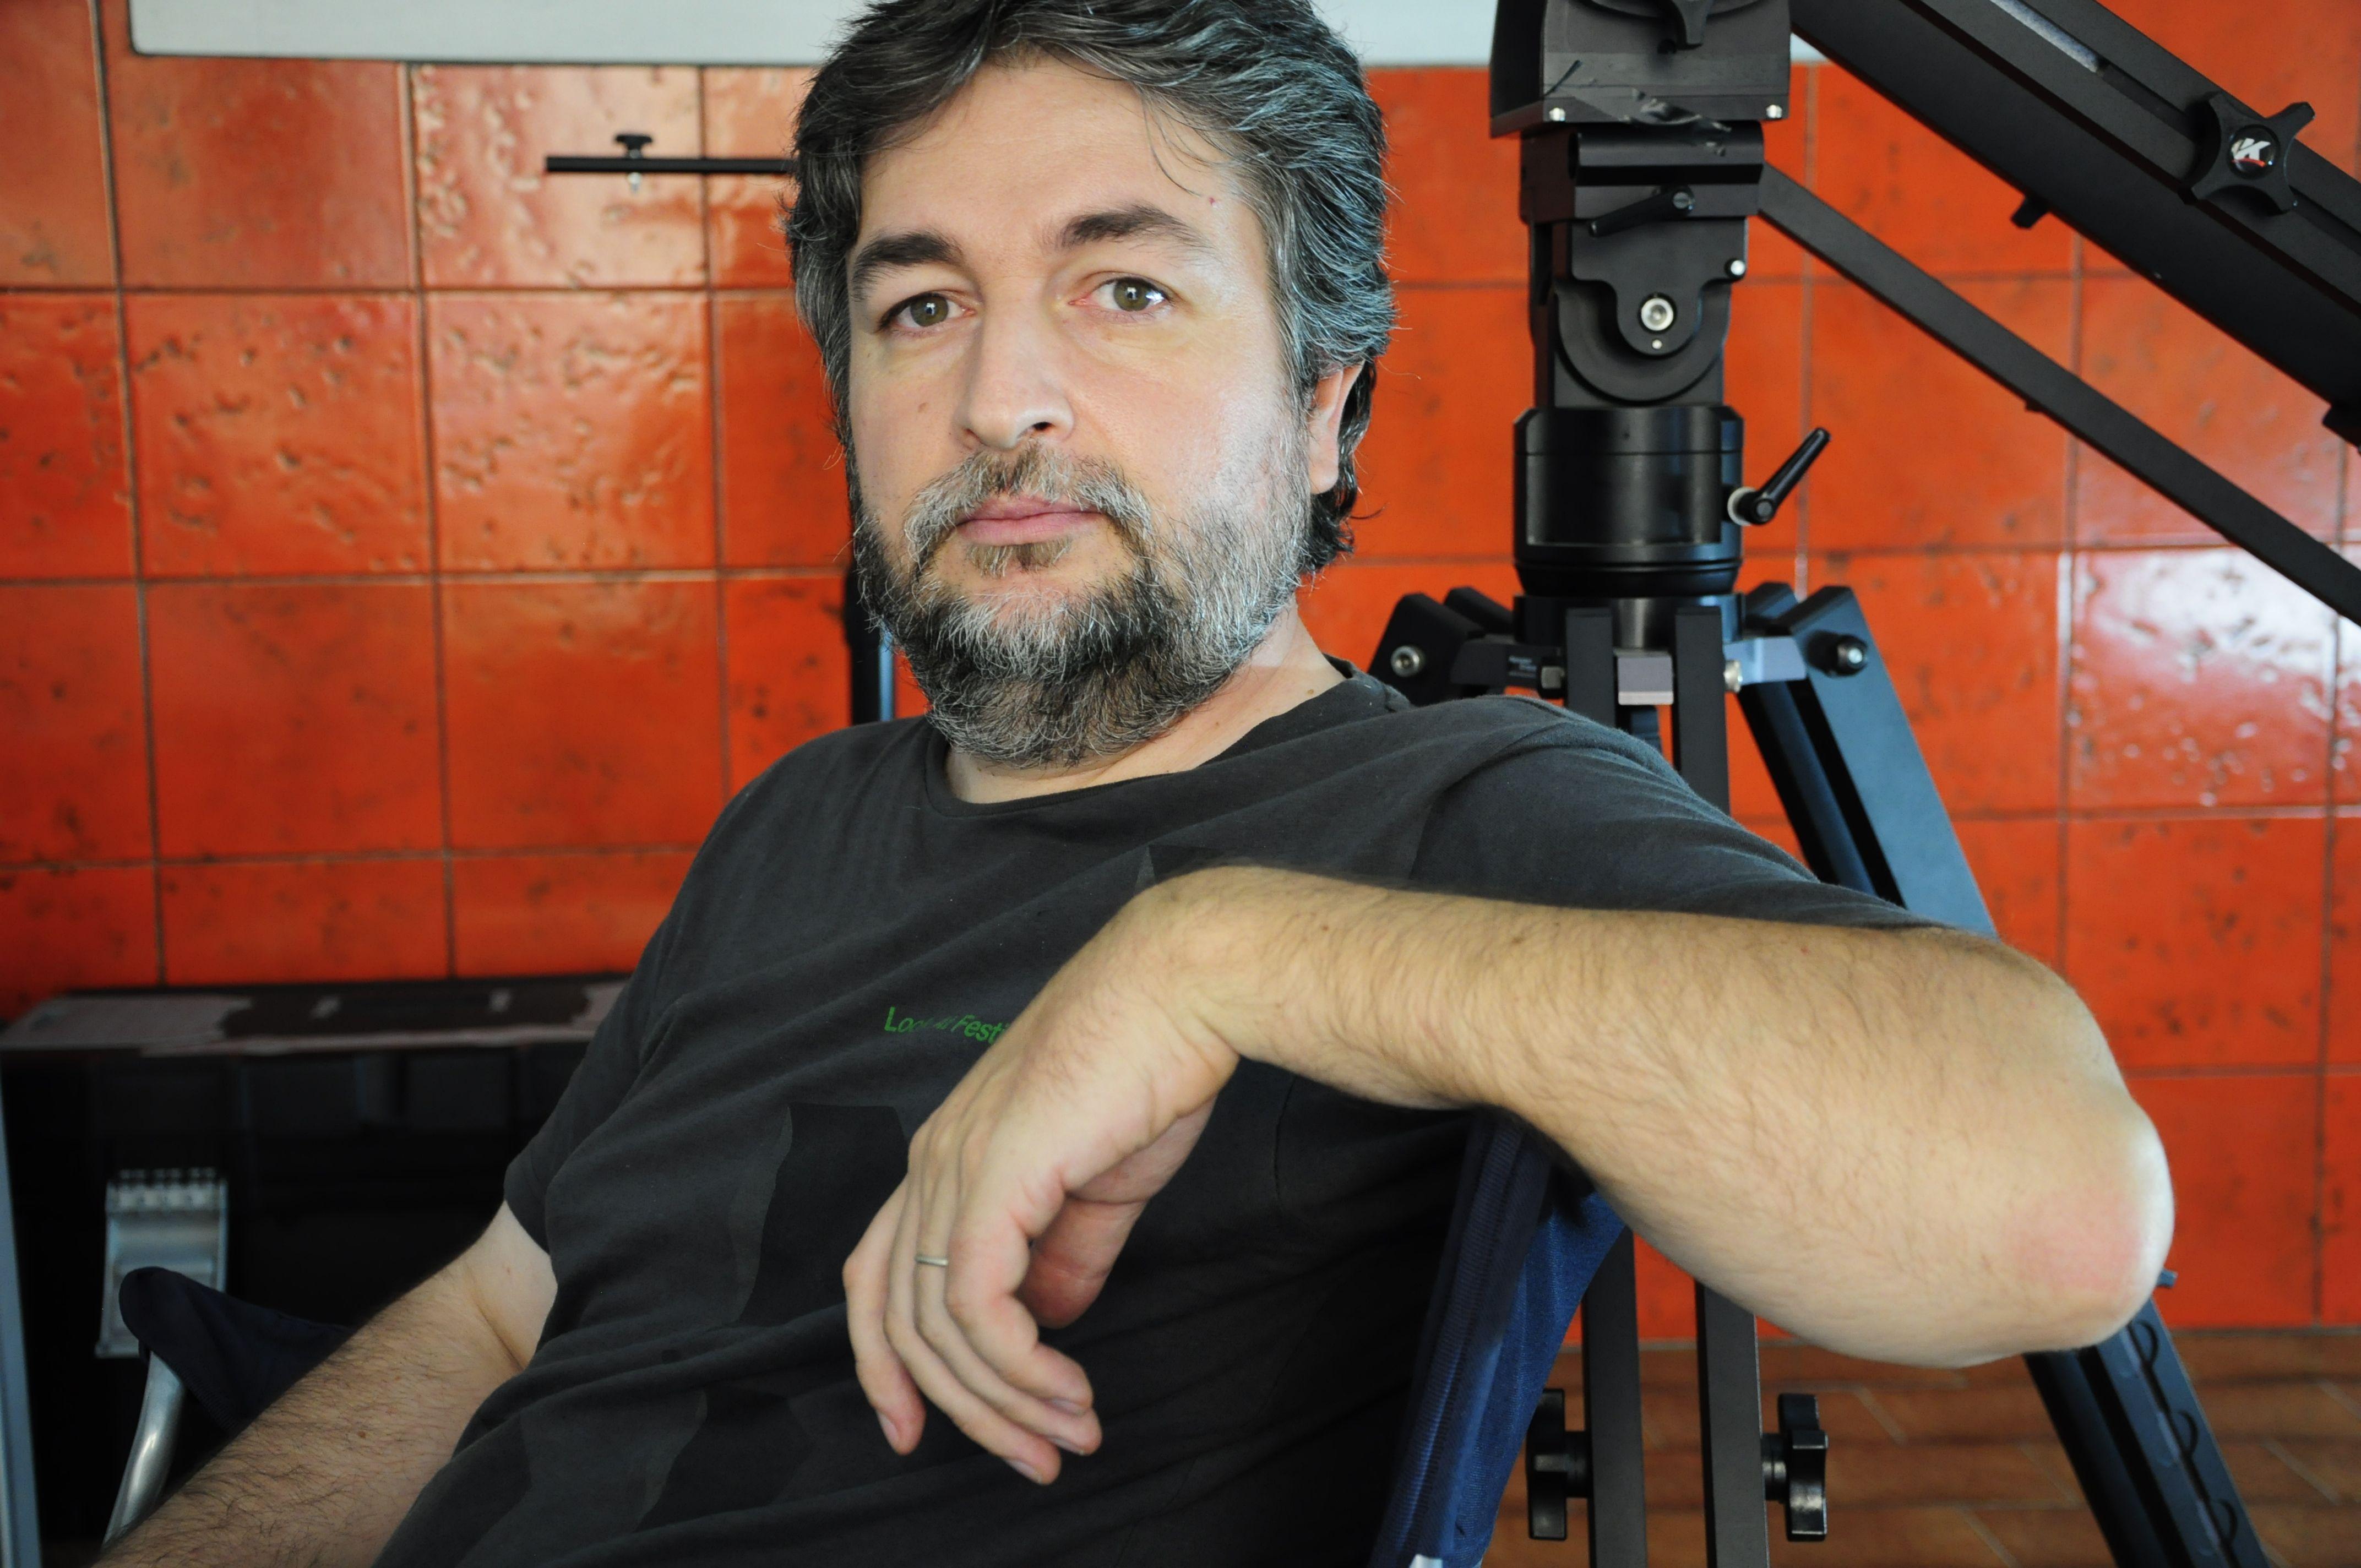 Fall_out_Marcantonio_Lunardi_Director_2